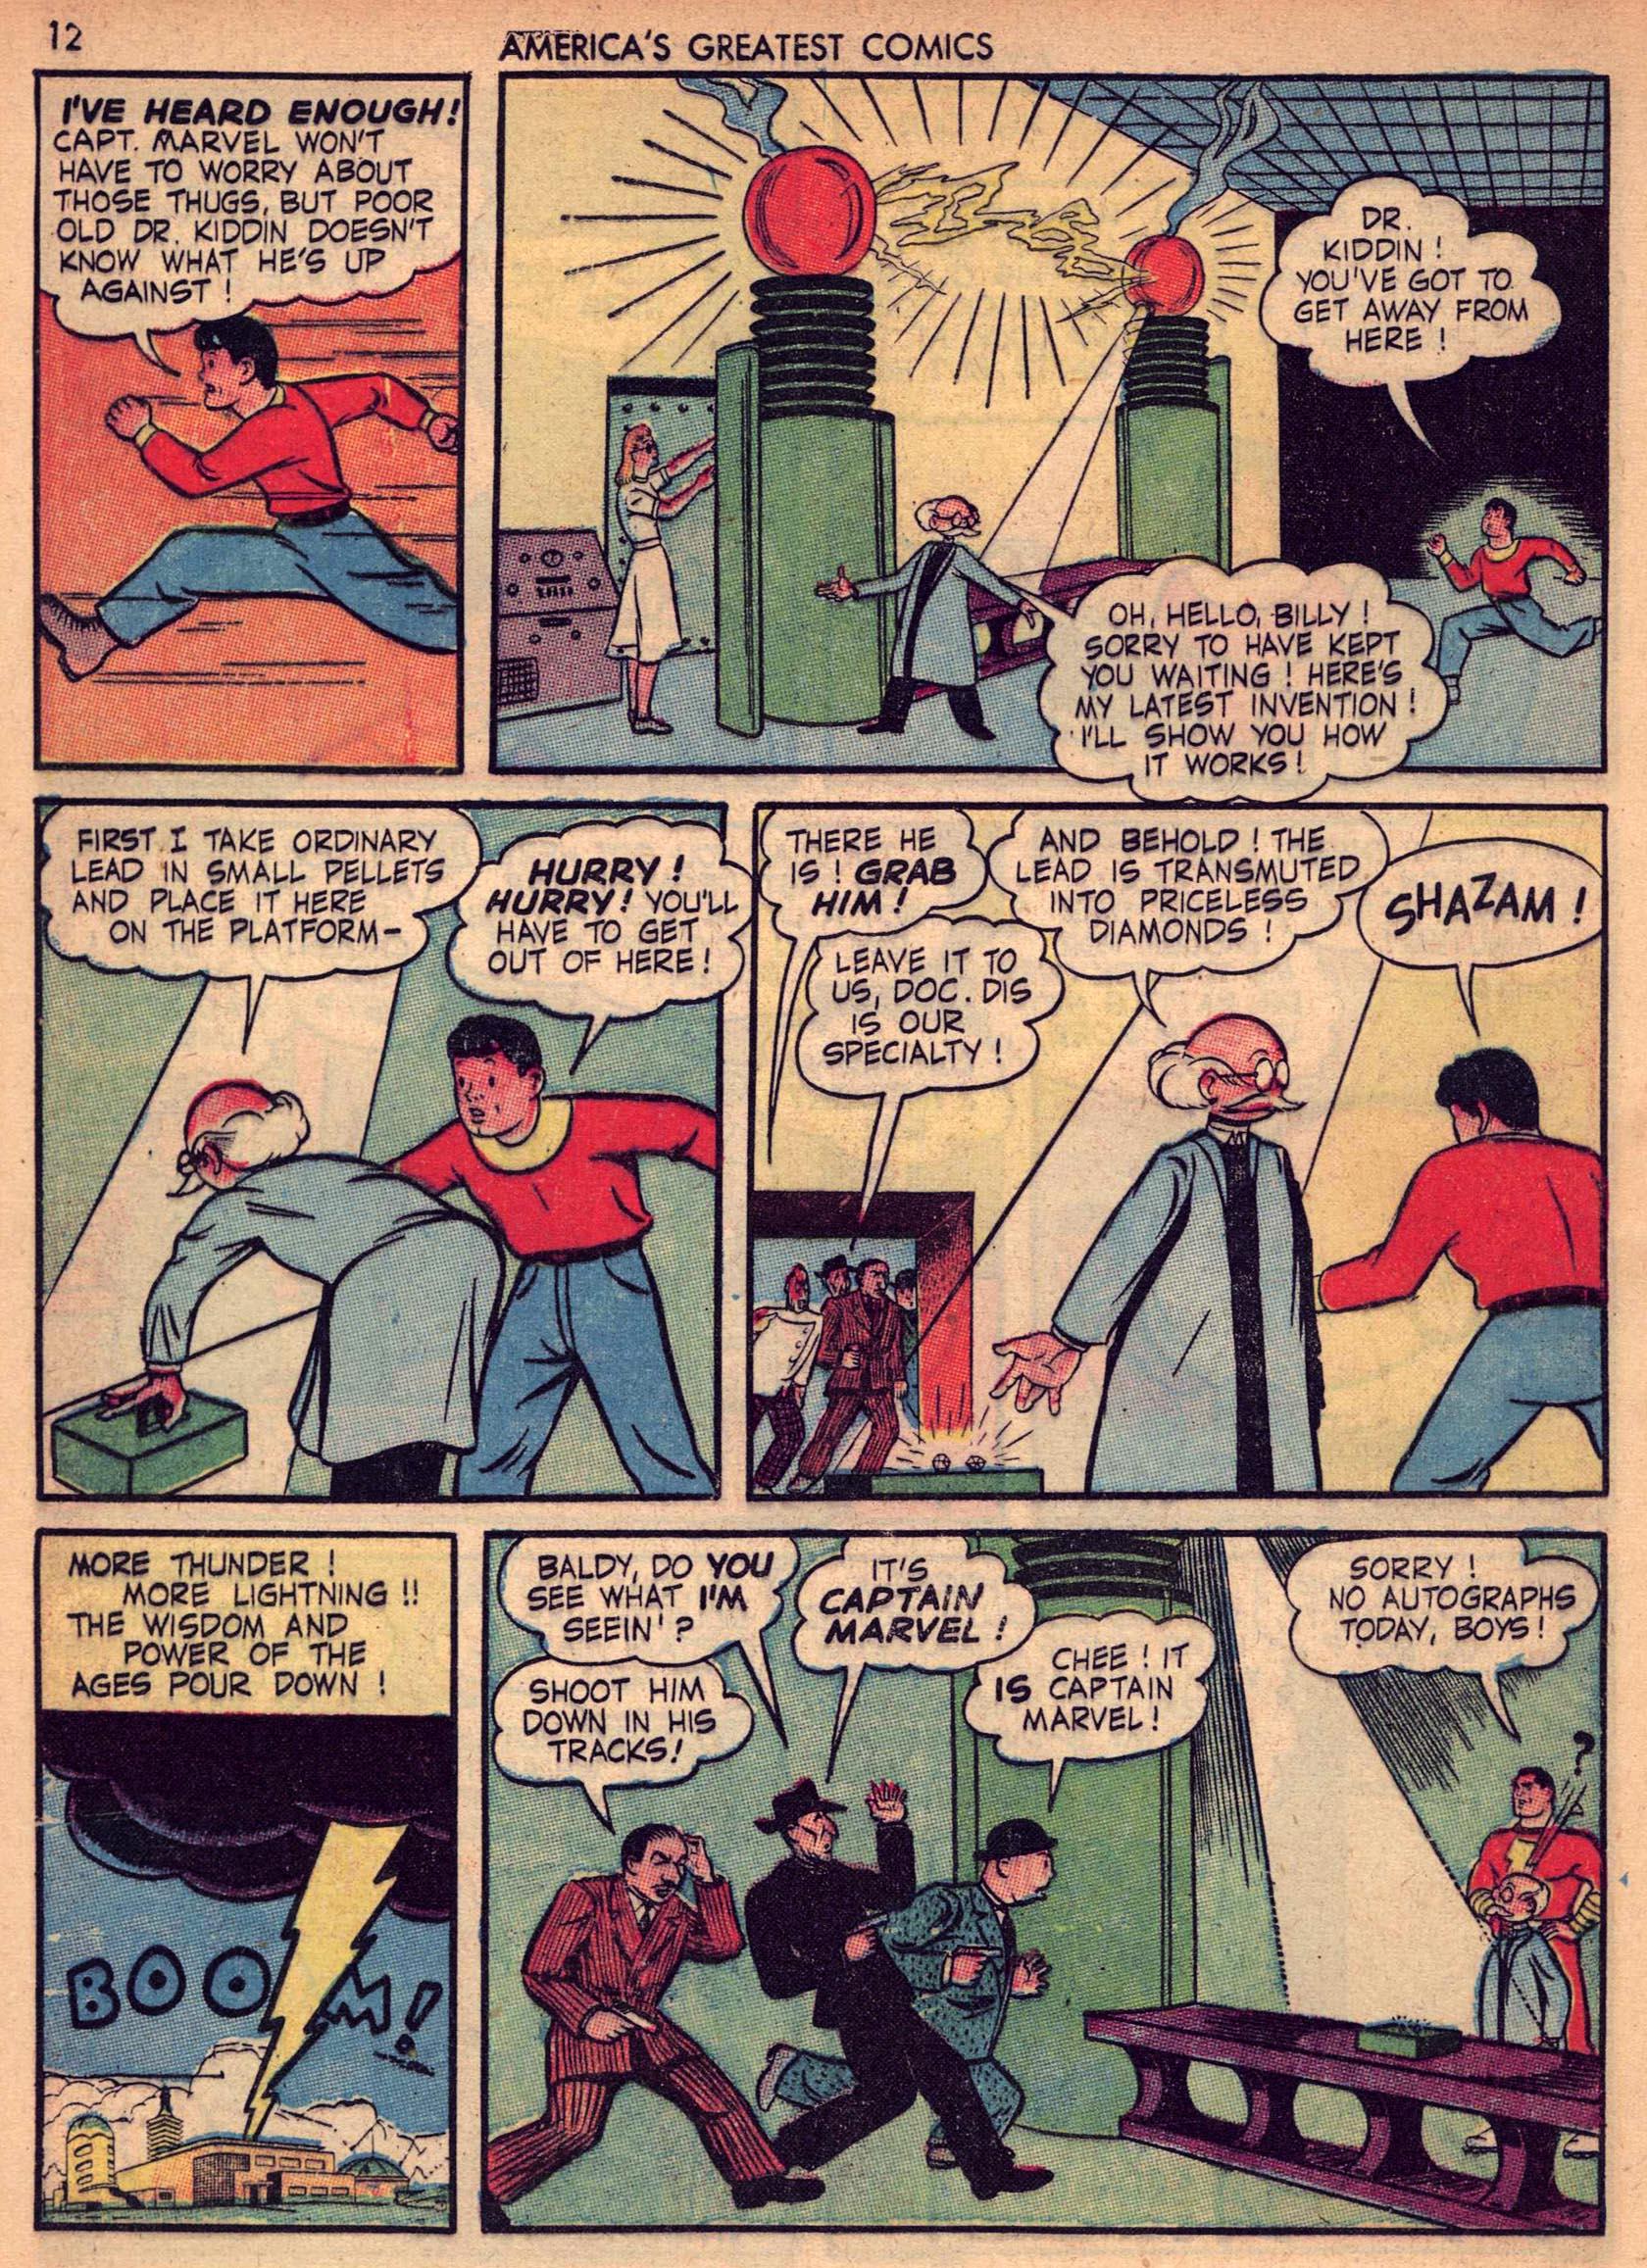 Read online America's Greatest Comics comic -  Issue #7 - 11